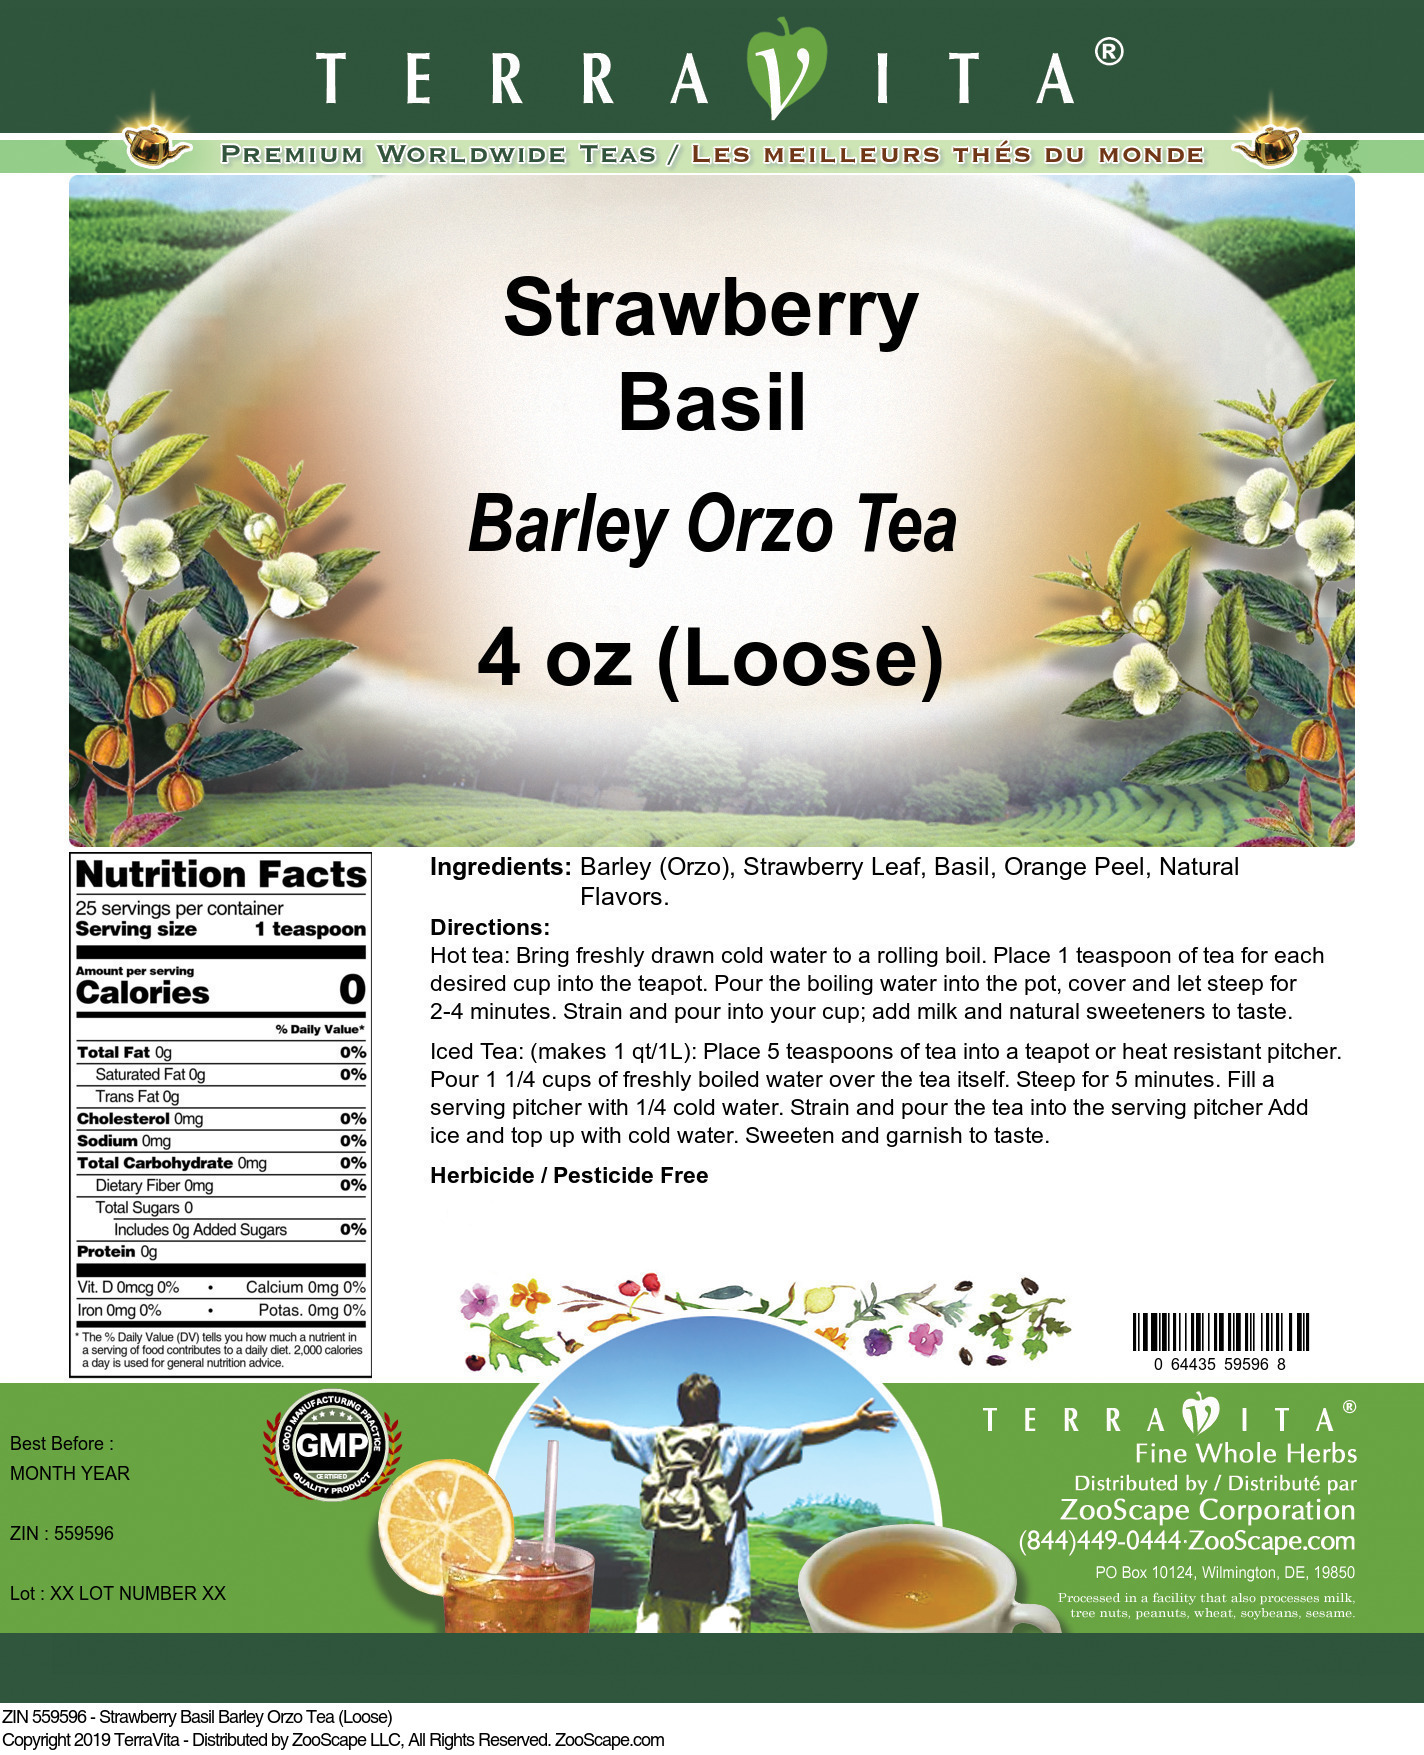 Strawberry Basil Barley Orzo